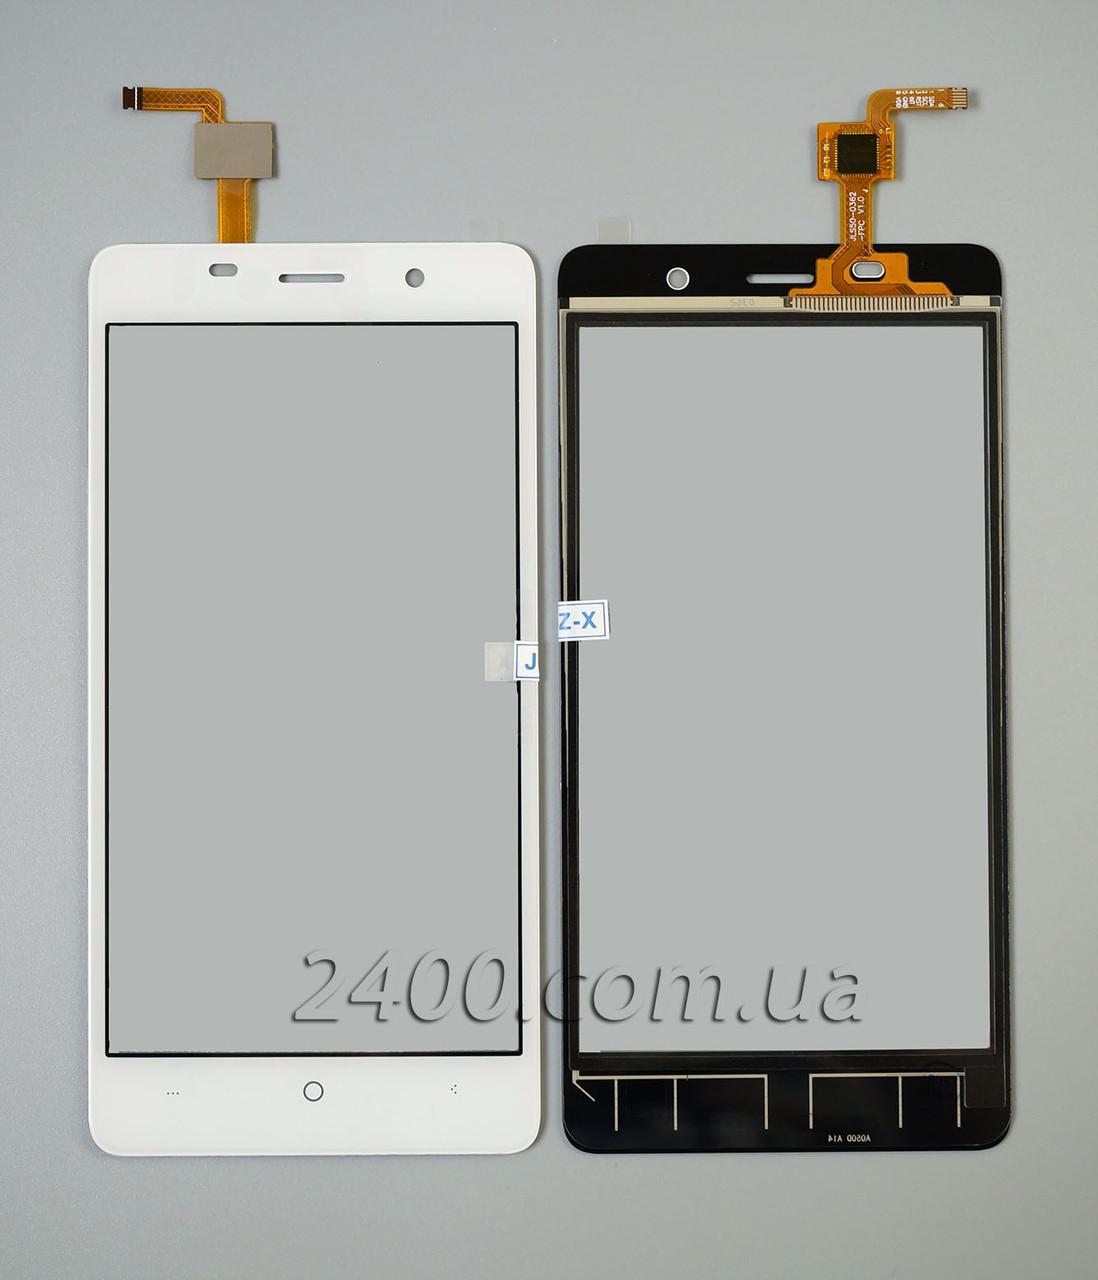 Тачскрин Bravis A504 (сенсор) - touchscreen для телефонов Бравис А504 Трейс (A 504 Trace) белый